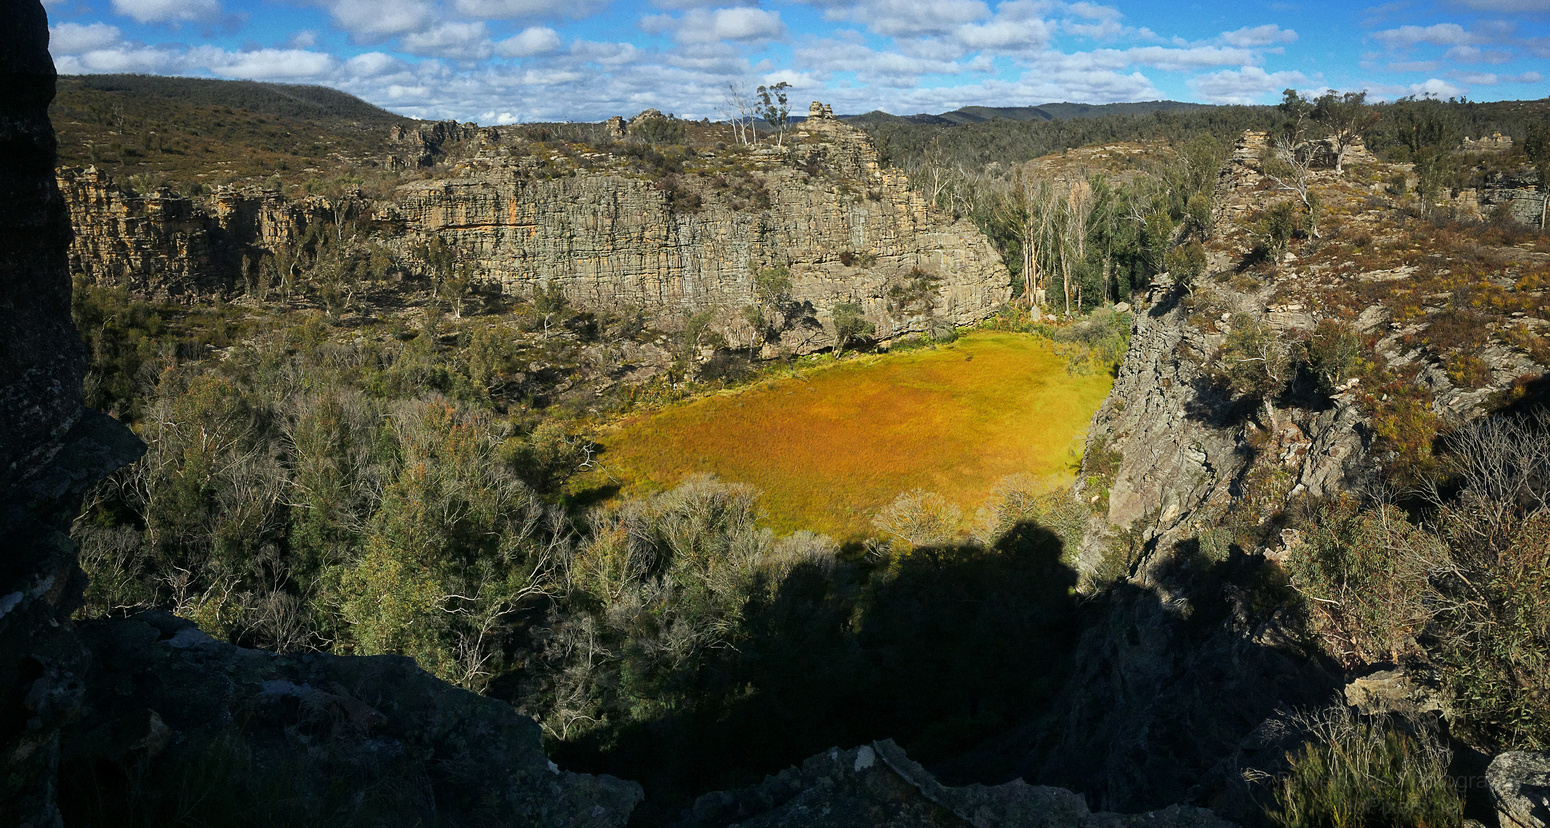 Goochs Crater